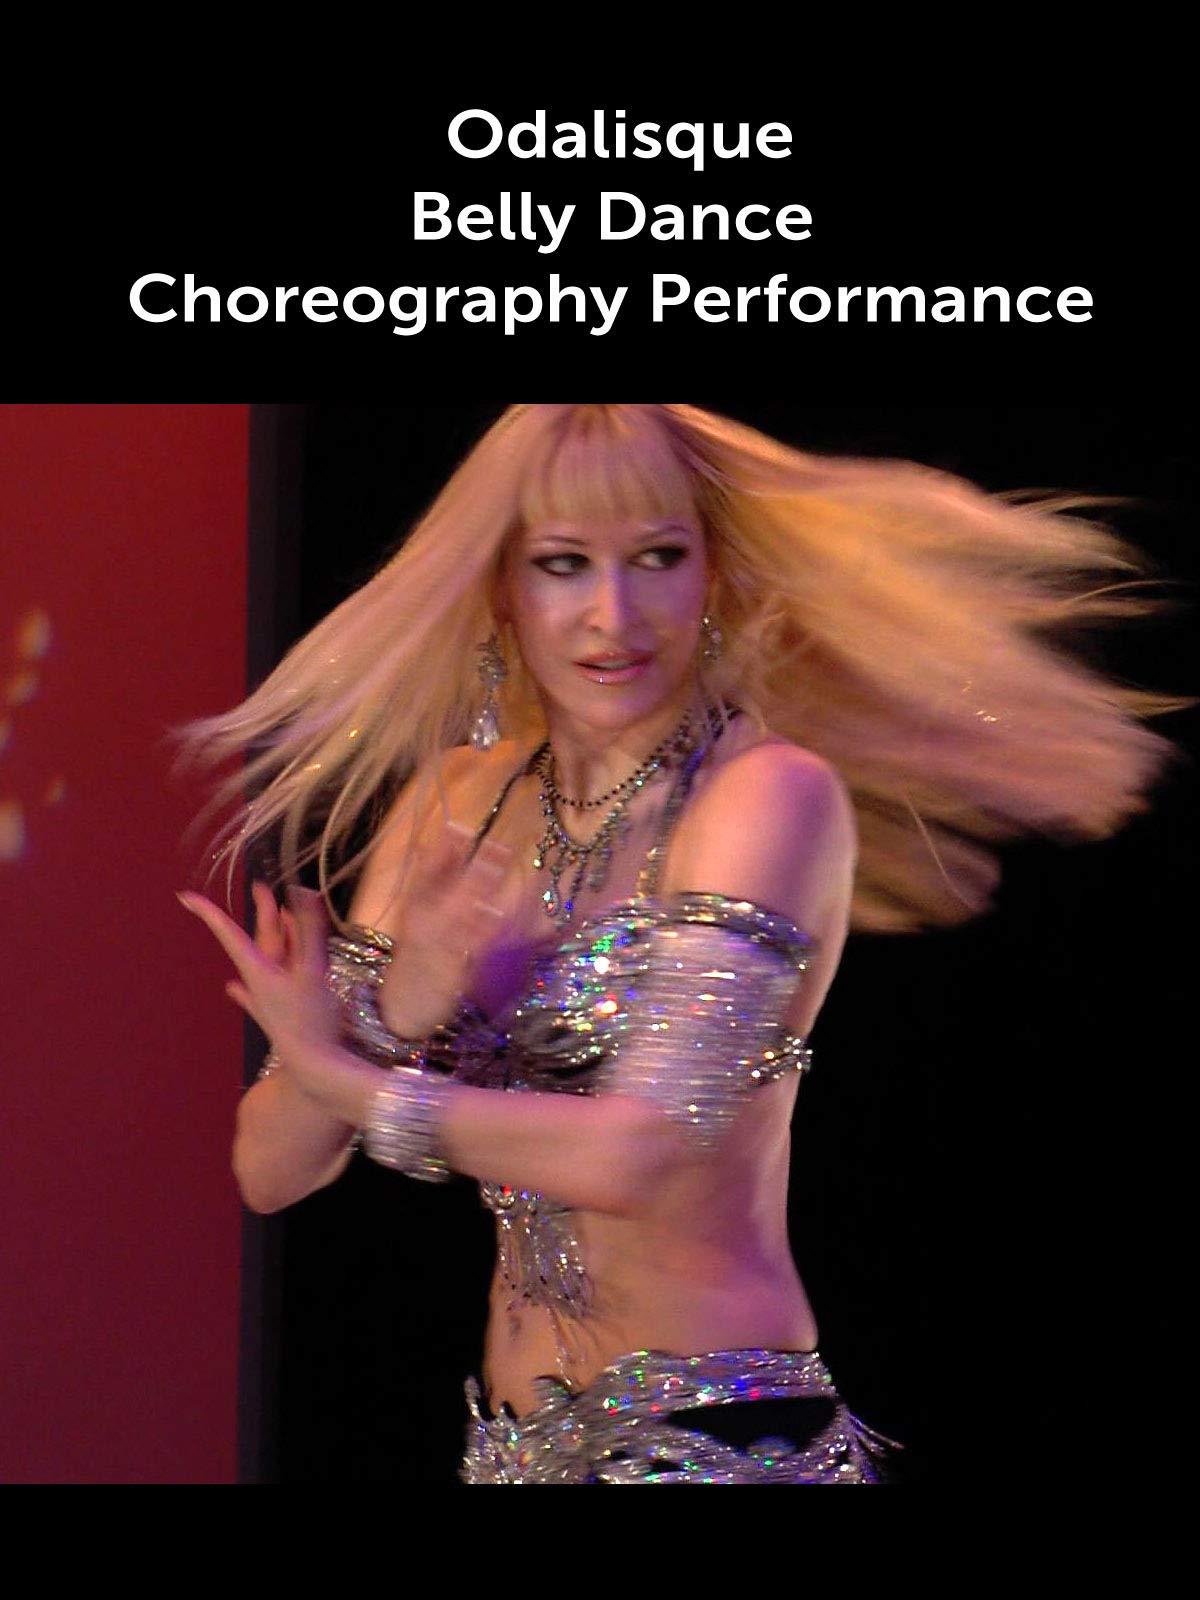 Odalisque - Belly Dance Choreography Performance on Amazon Prime Video UK